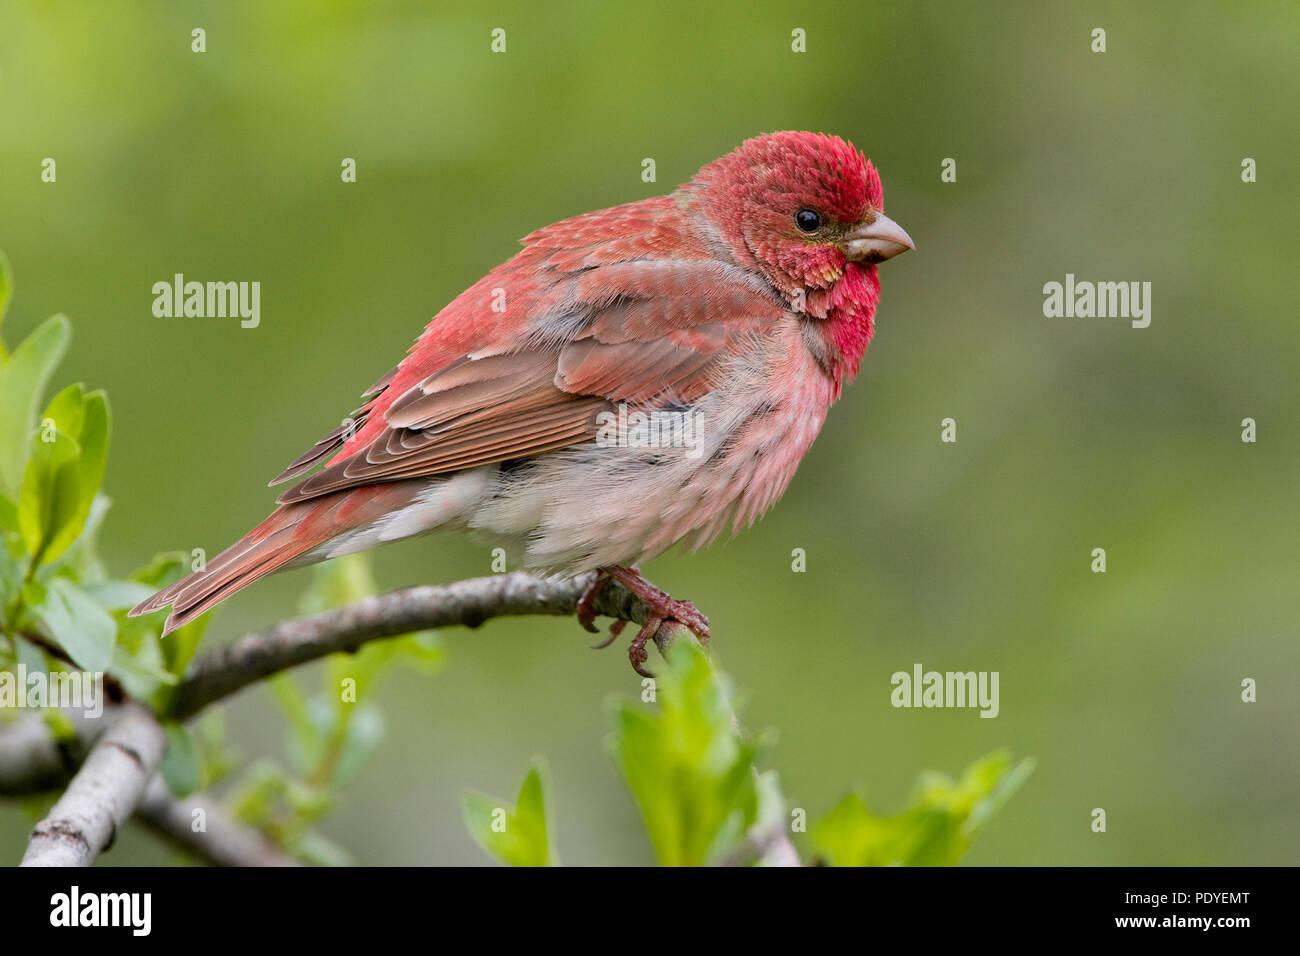 A Scarlet Rosefinch on a spray. - Stock Image